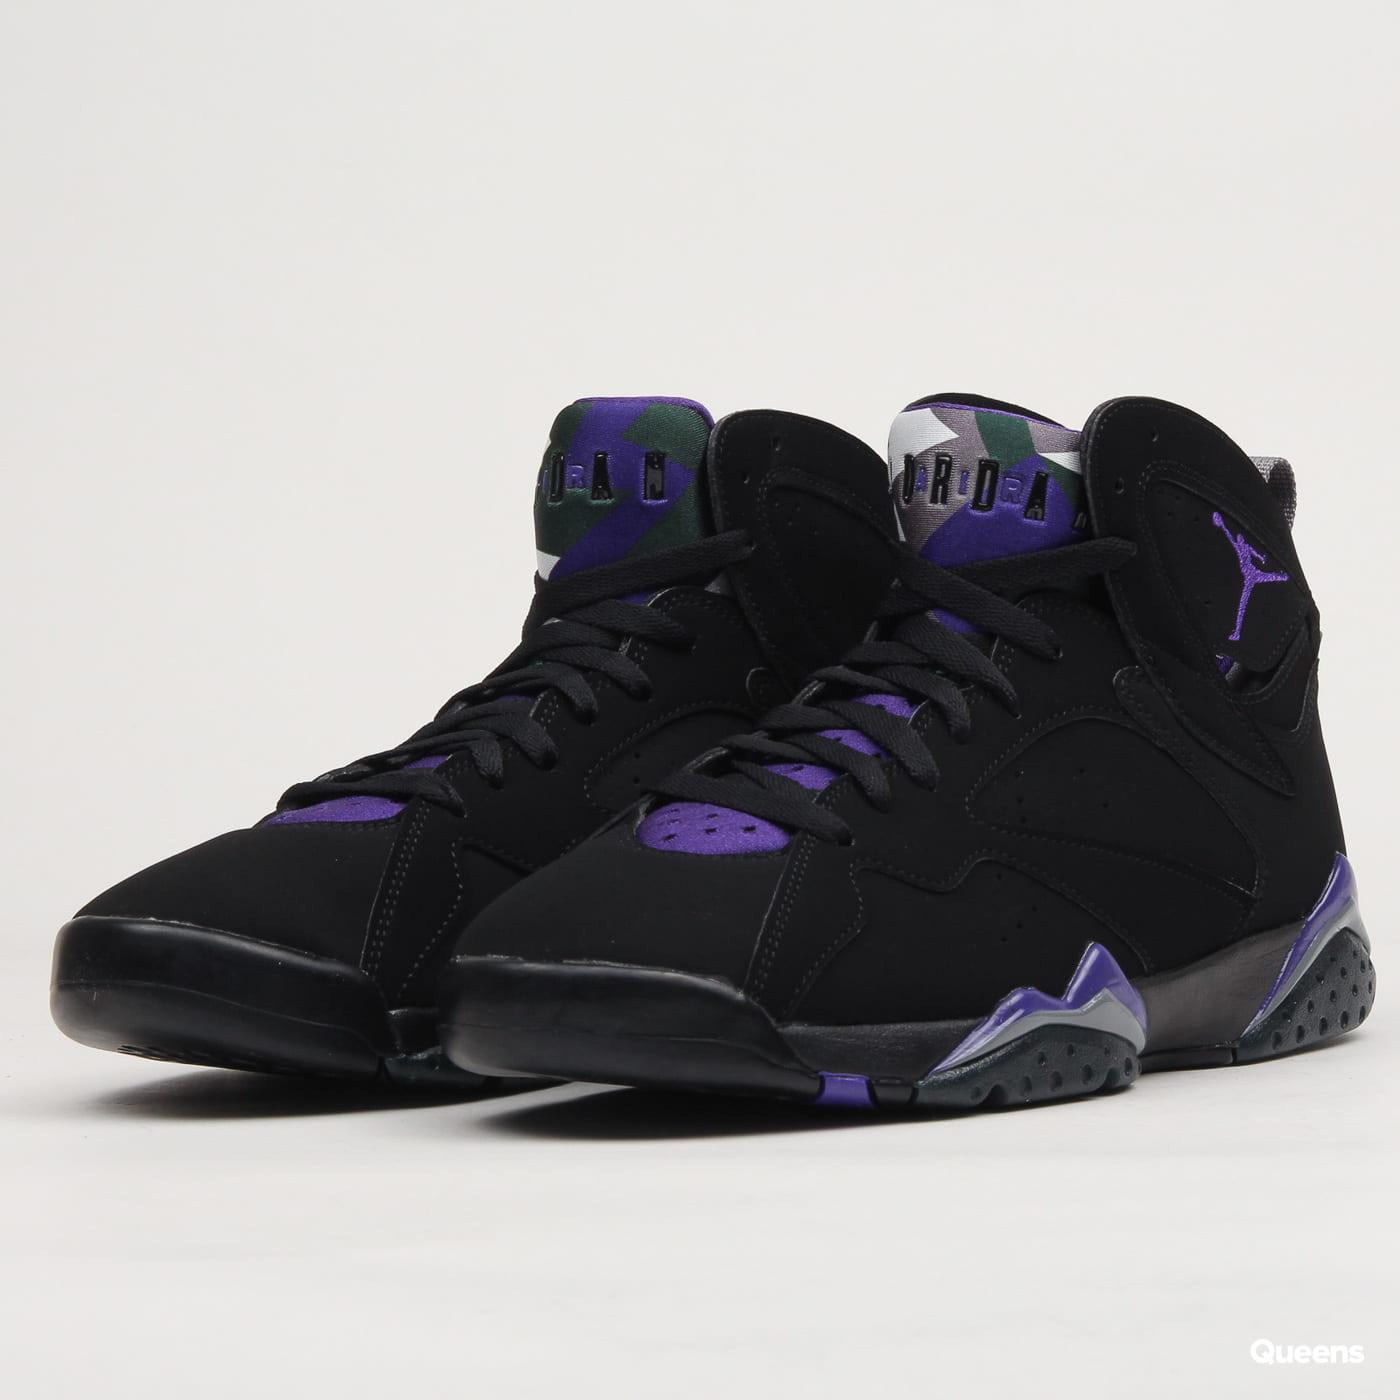 vente chaude en ligne 2cf07 7b92c Nike Air Jordan 7 Retro black / field purple - fir